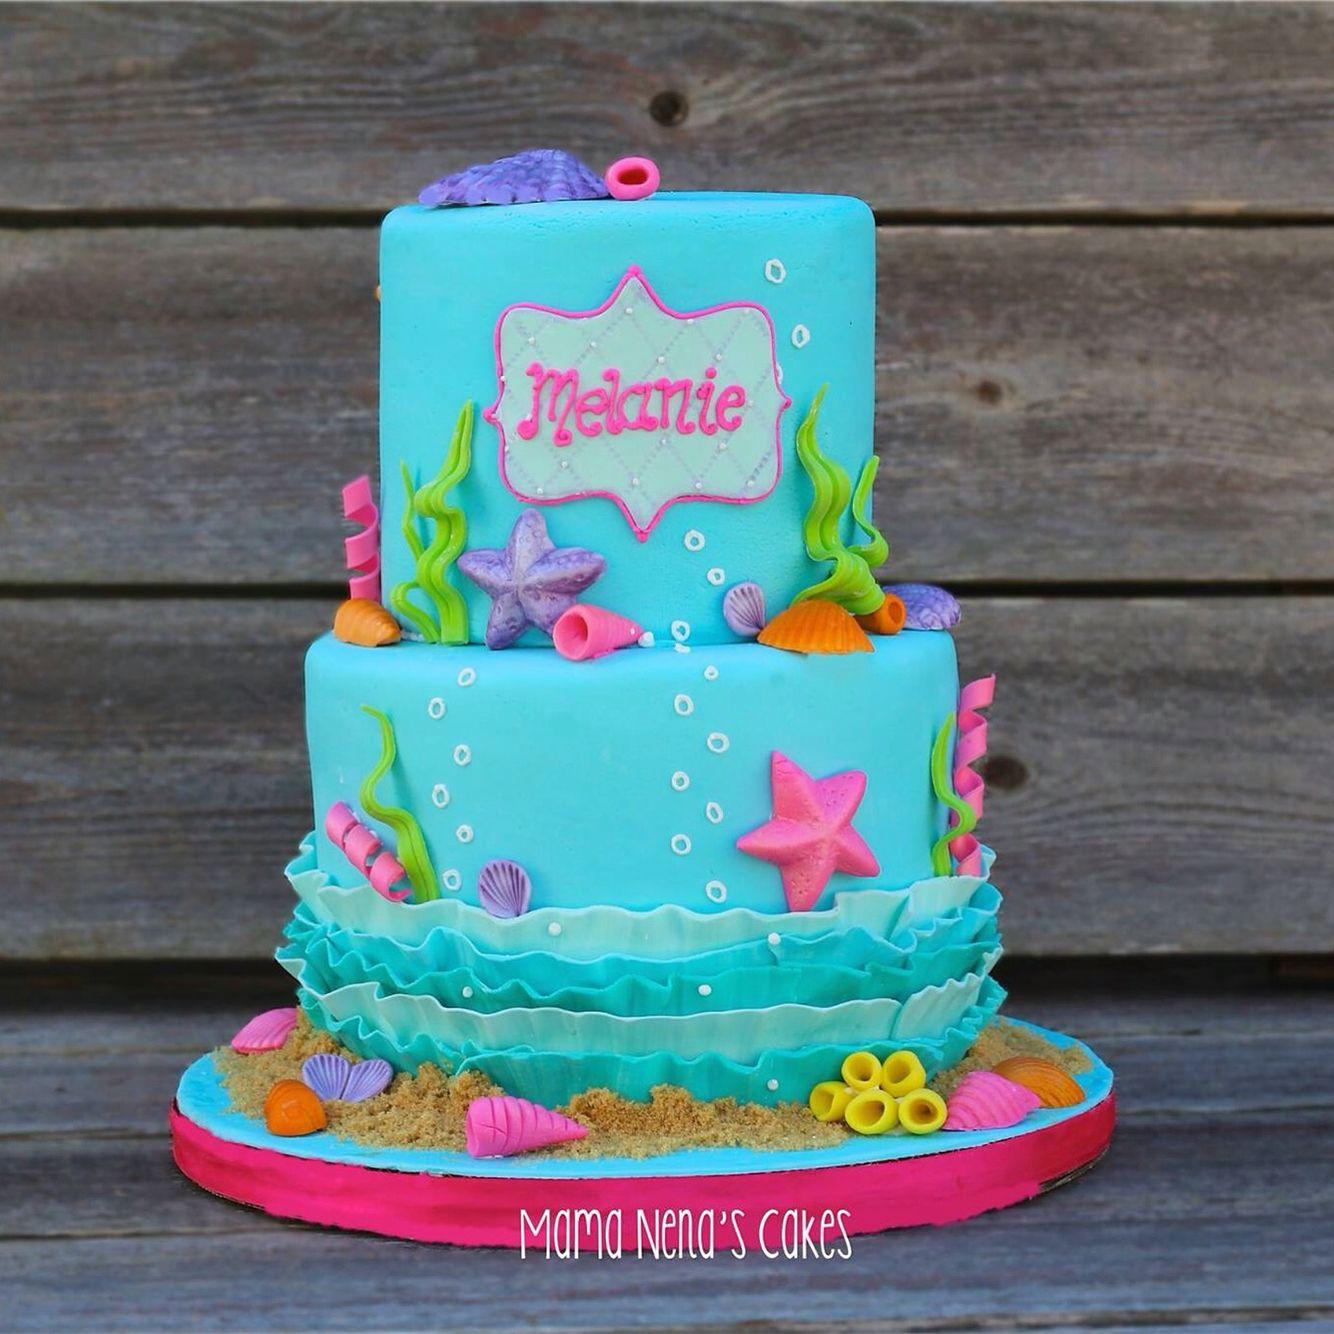 Uncategorized Little Mermaid Birthday Cake the little mermaid cake under sea kids birthday cakes